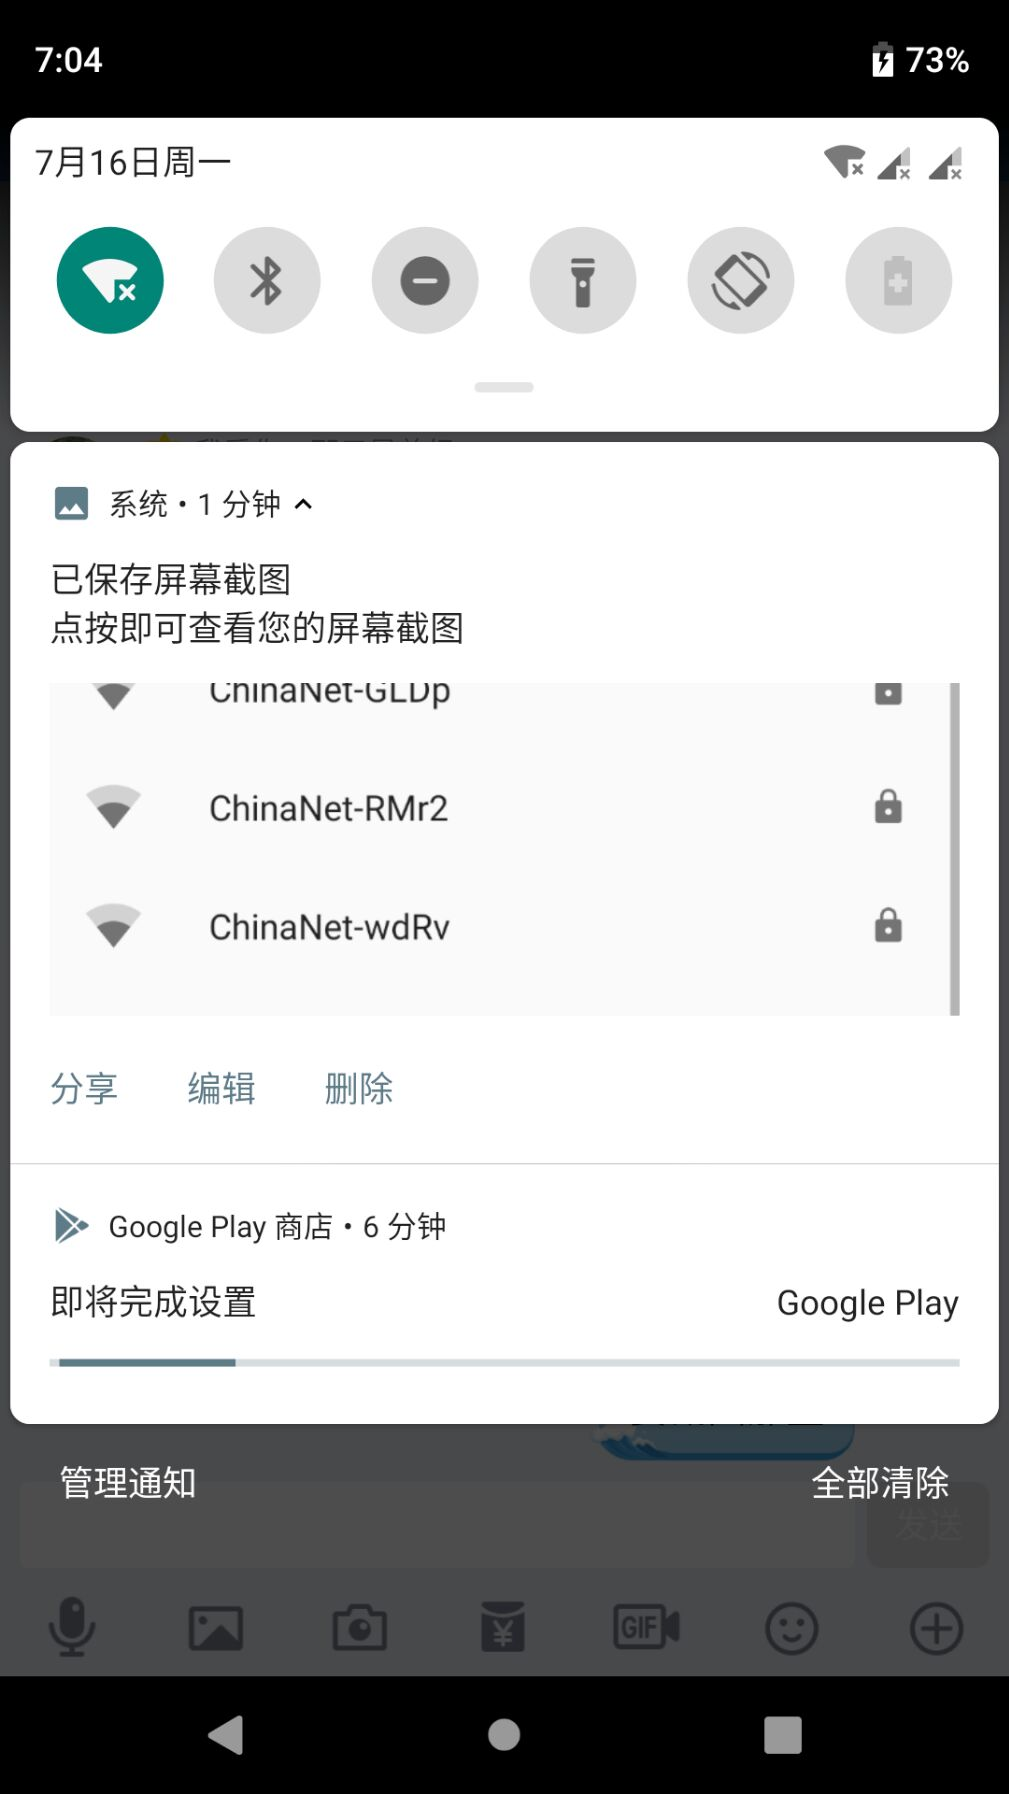 0807更新一加5/5T安装安卓9.0 Android P(Pie)正式版教程插图2